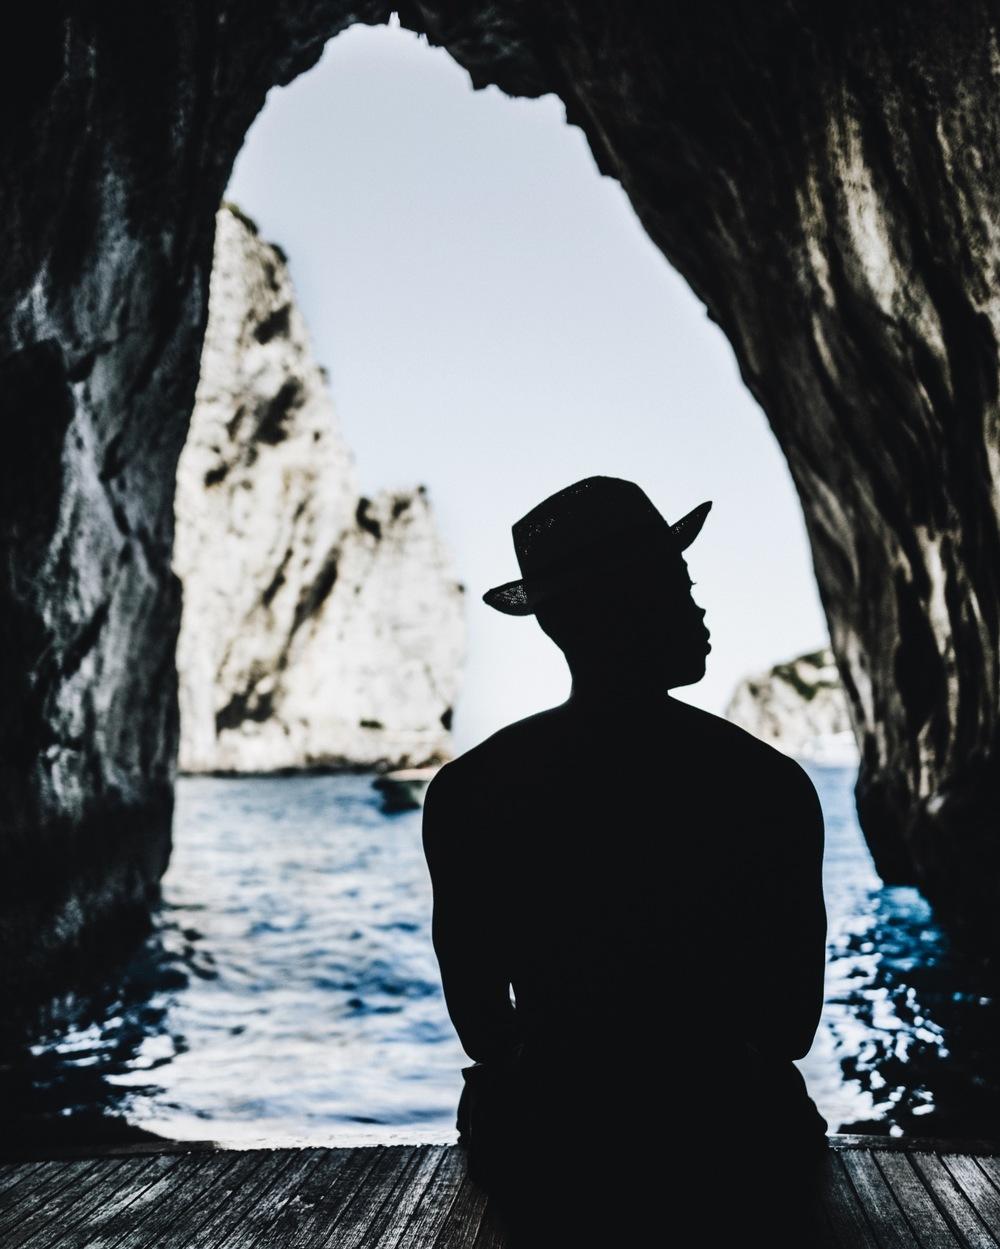 Veni-Vidi-Amavi-Dapper-Lou-Capri-Italy-Travel-Inspiration-2016-Blog-6.JPG